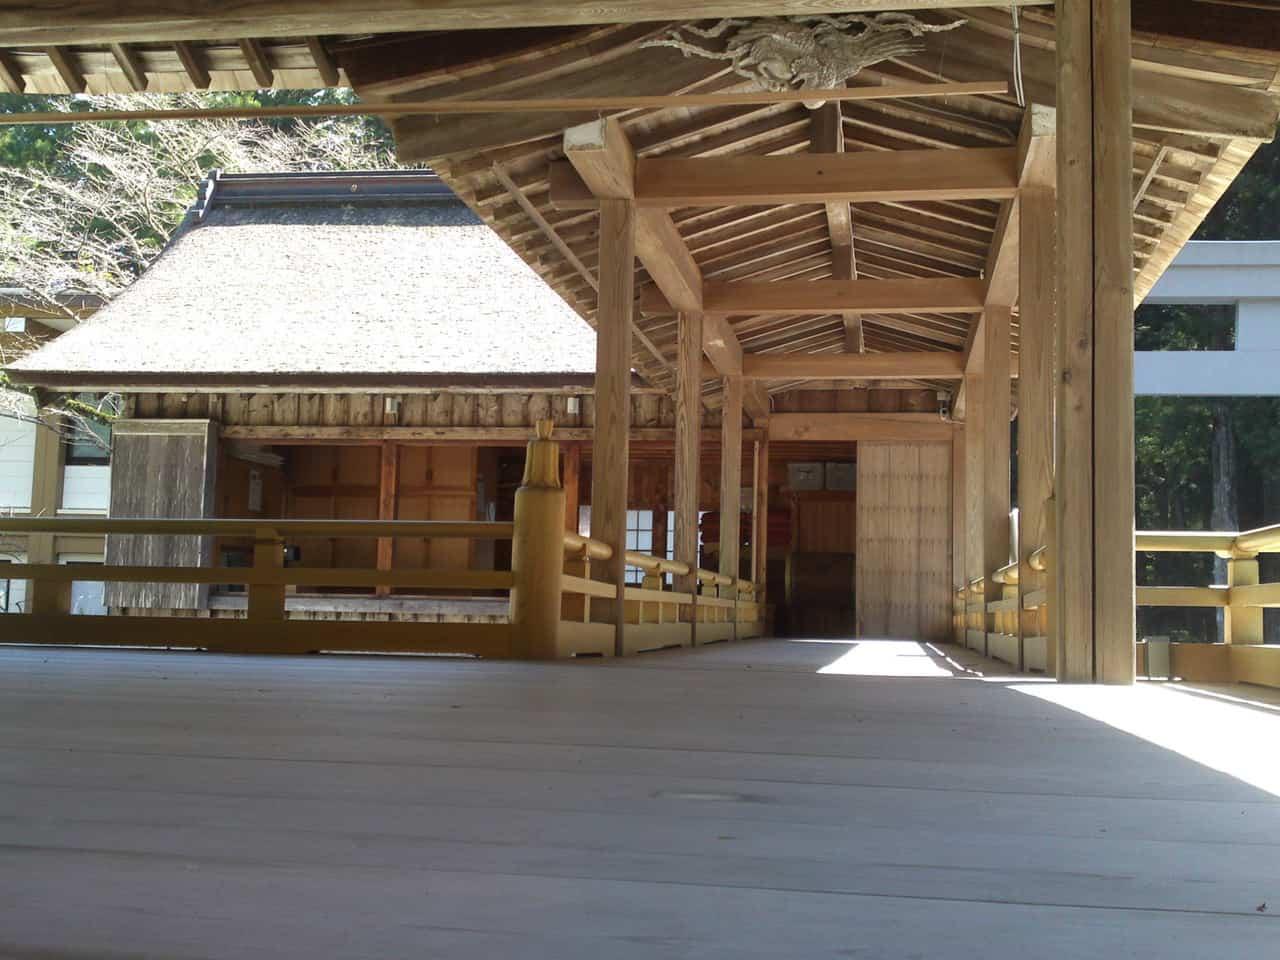 Noh stage at Okuni Shrine in Mori Machi, Hamamatsu